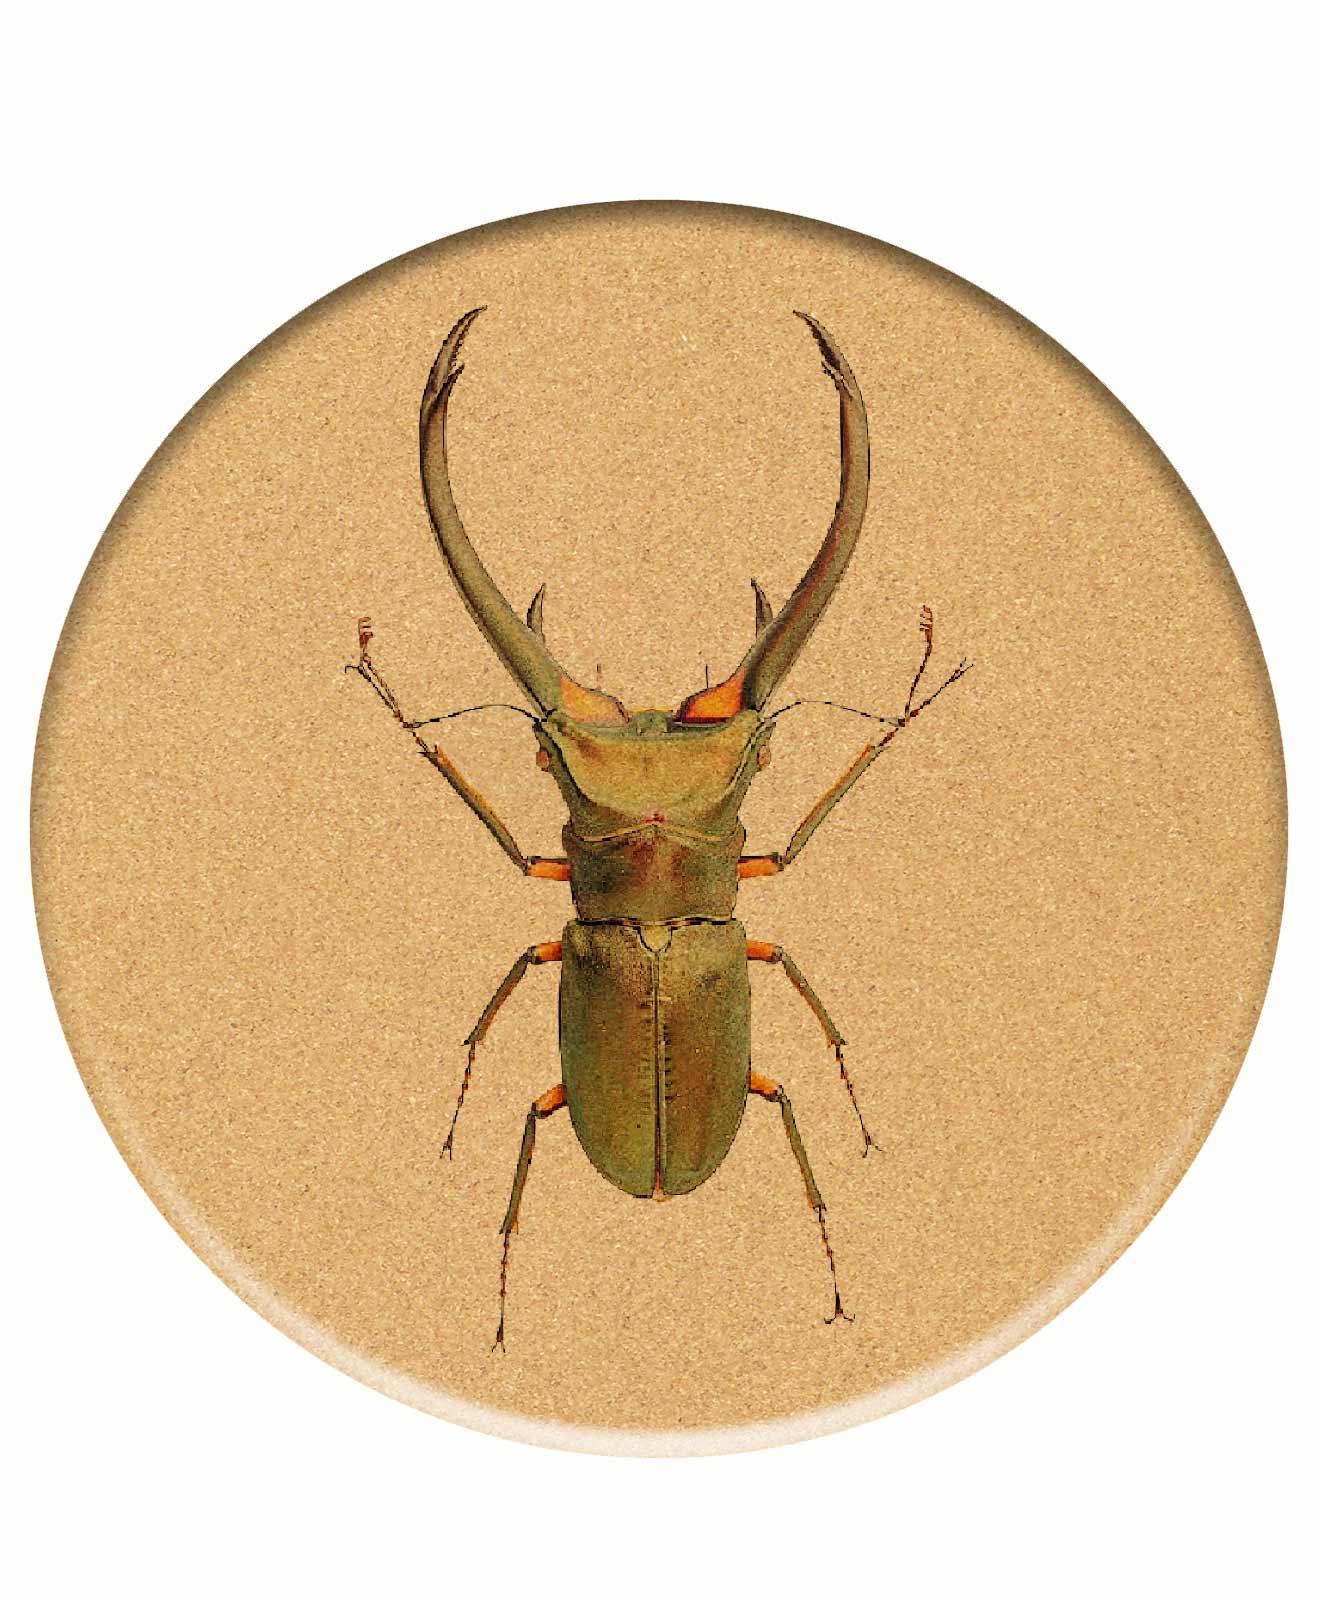 Big Bugs Cork Trivet thursday